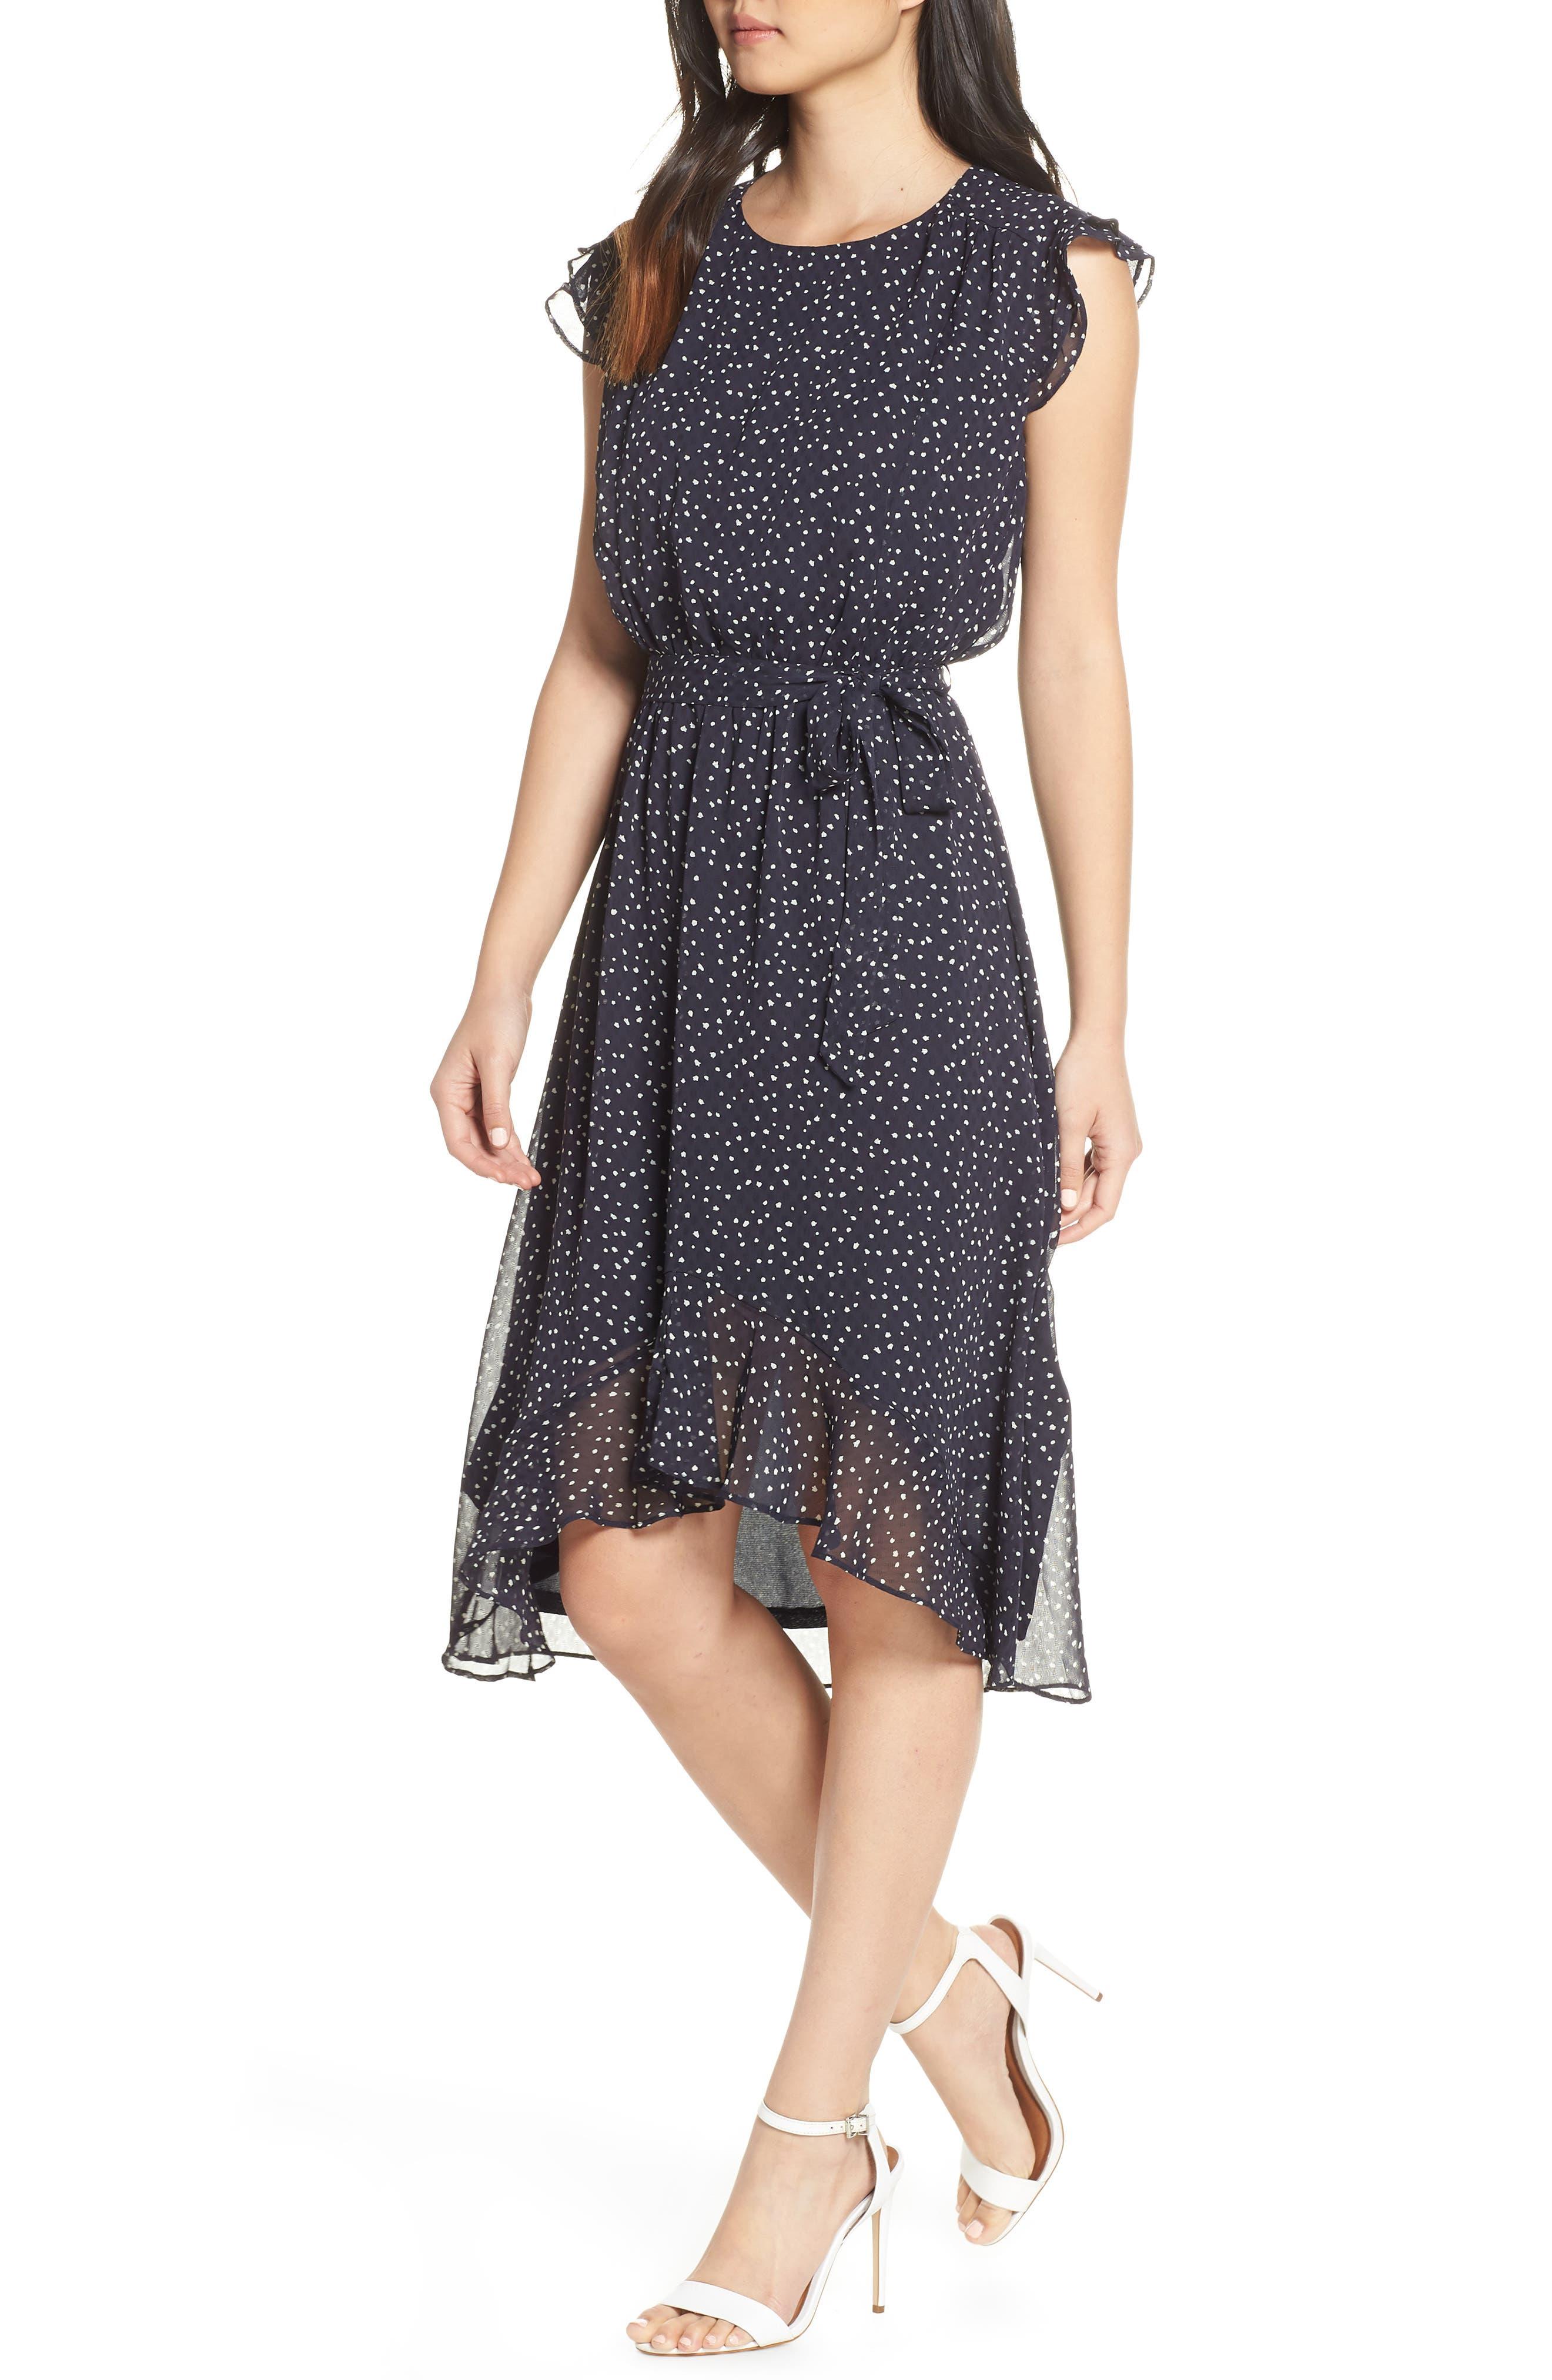 19 COOPER, Polka Dot Ruffle Sleeve Chiffon Dress, Main thumbnail 1, color, 400